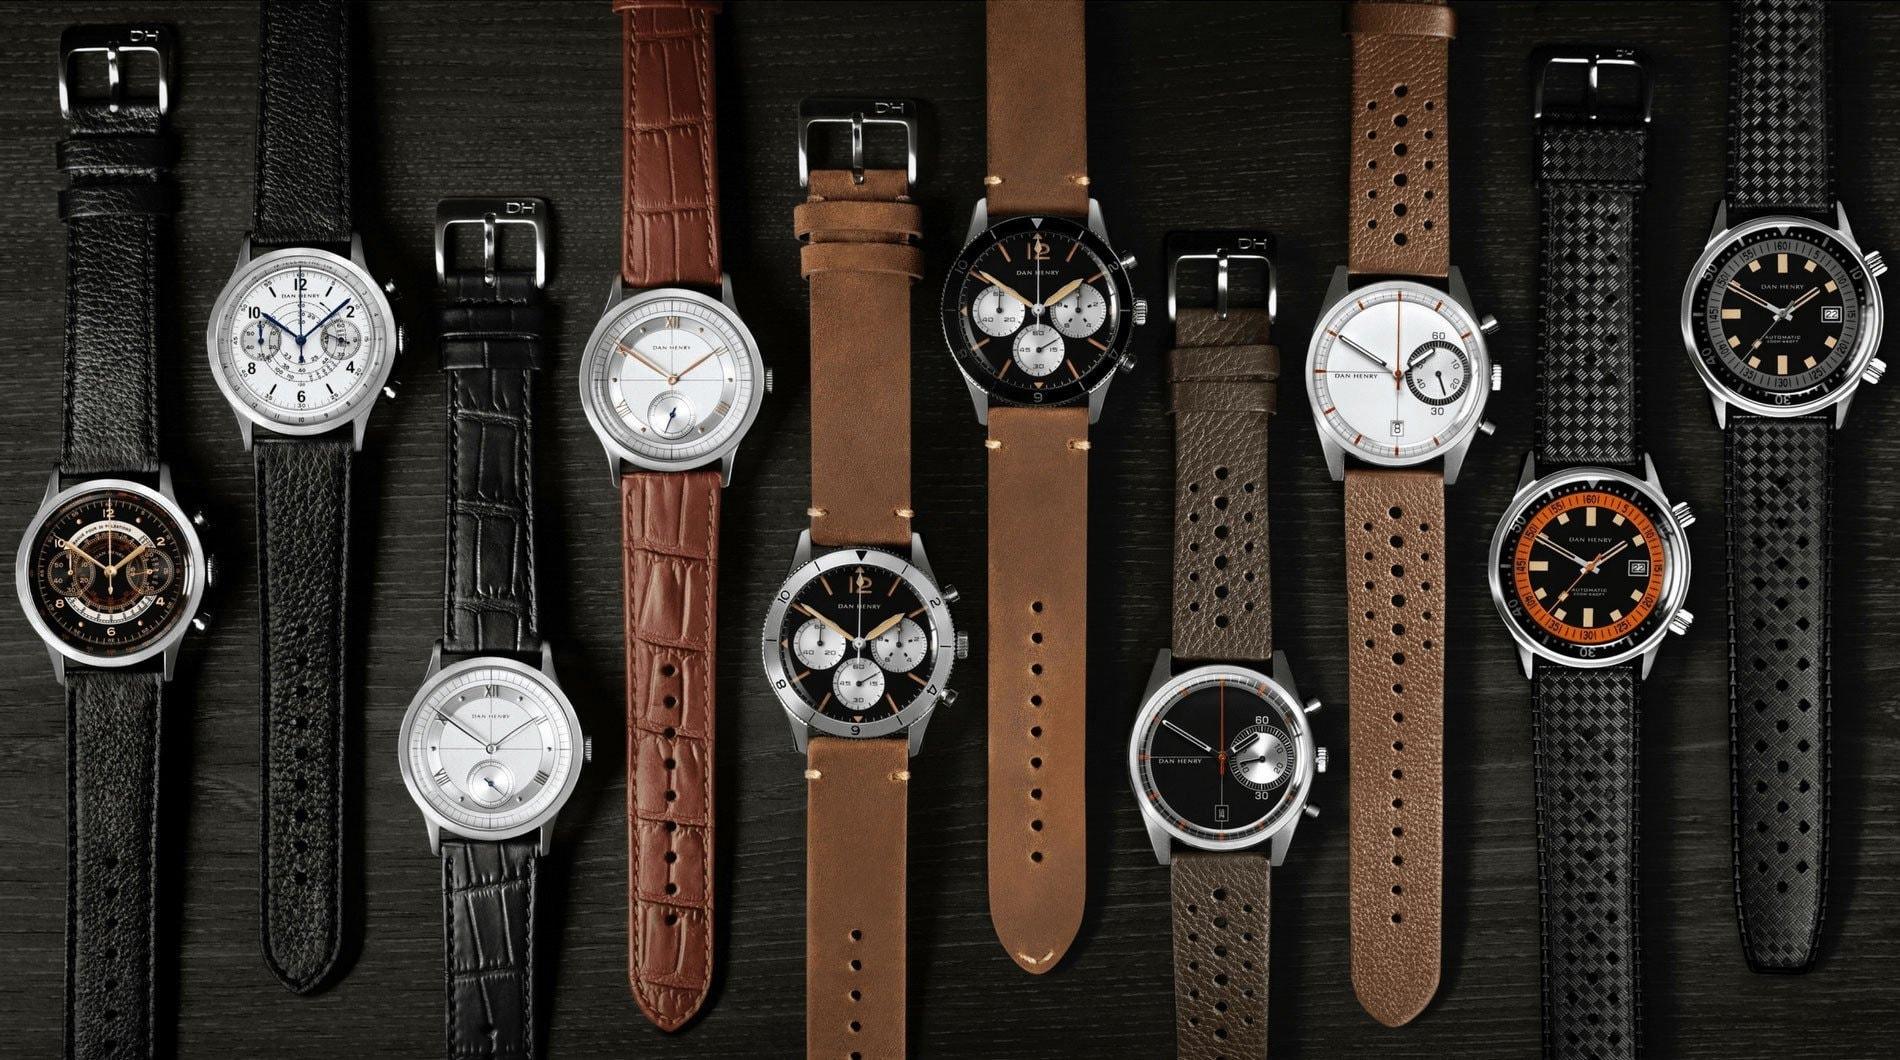 Armbanduhren des Microbrand-Uhrenherstellers Dan Henry Watches